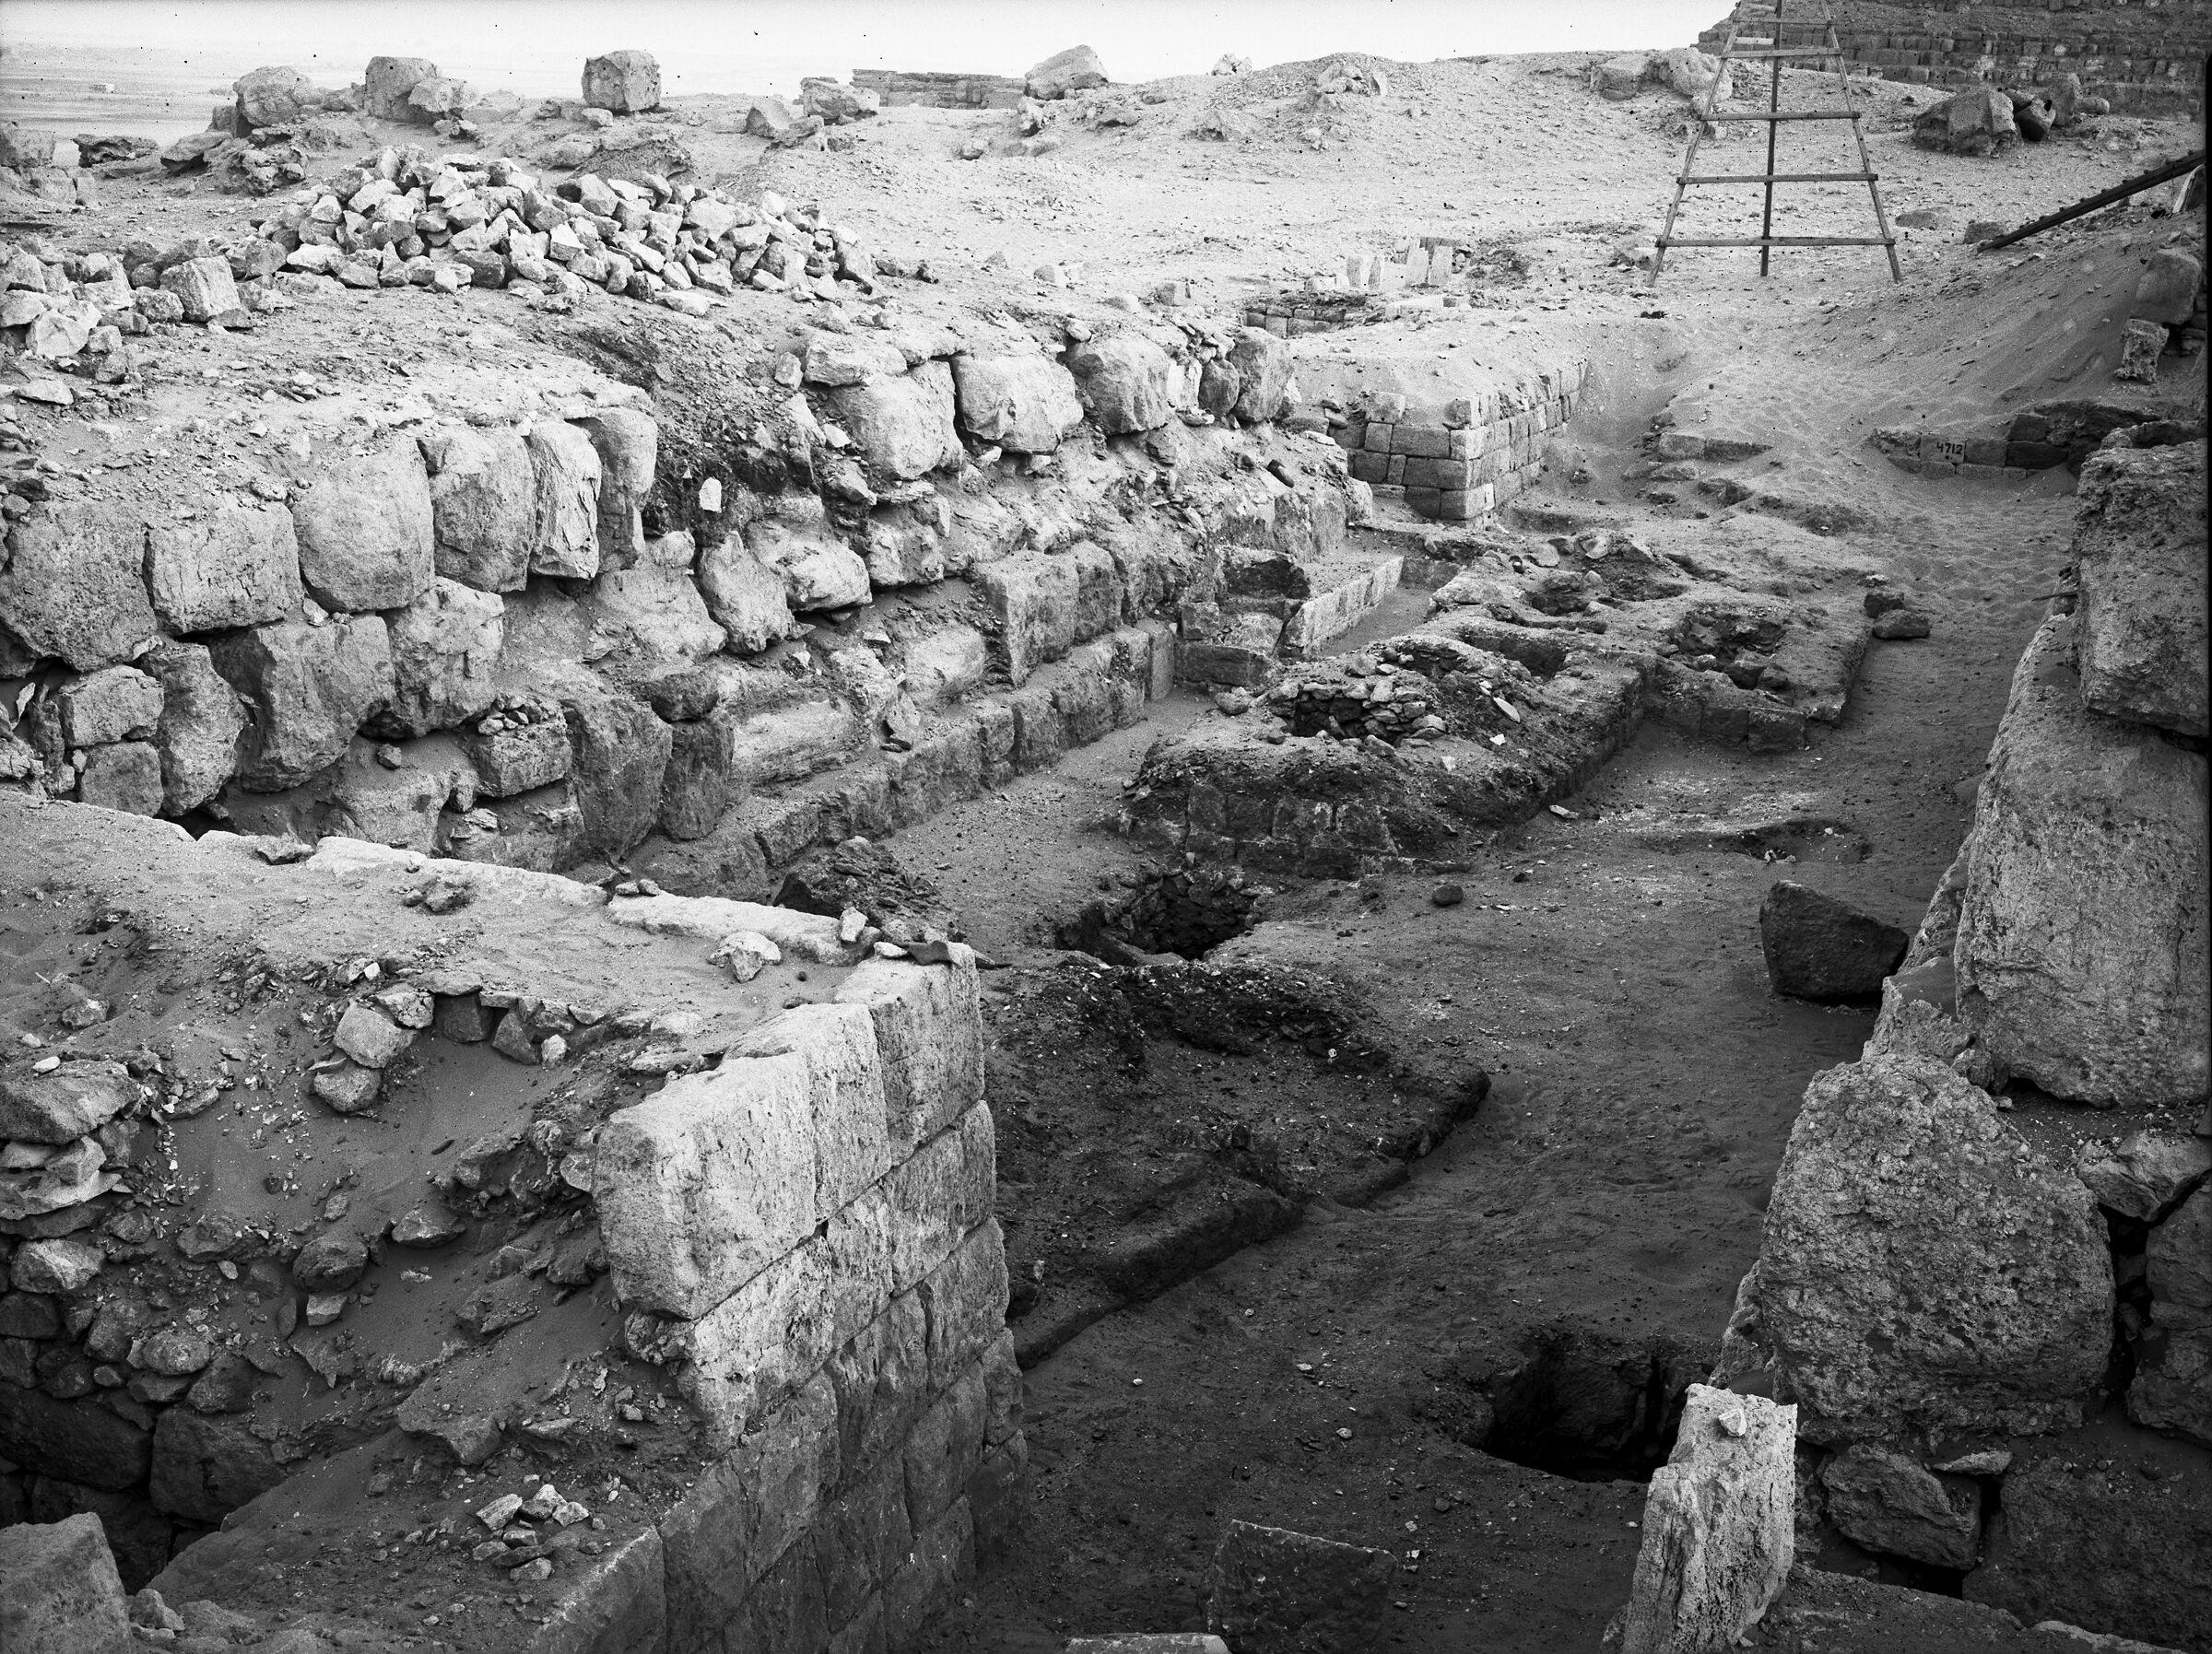 Western Cemetery: Site: Giza; View: G 4720, G 4820, G 4724, G 4722, G 4723, G 4733